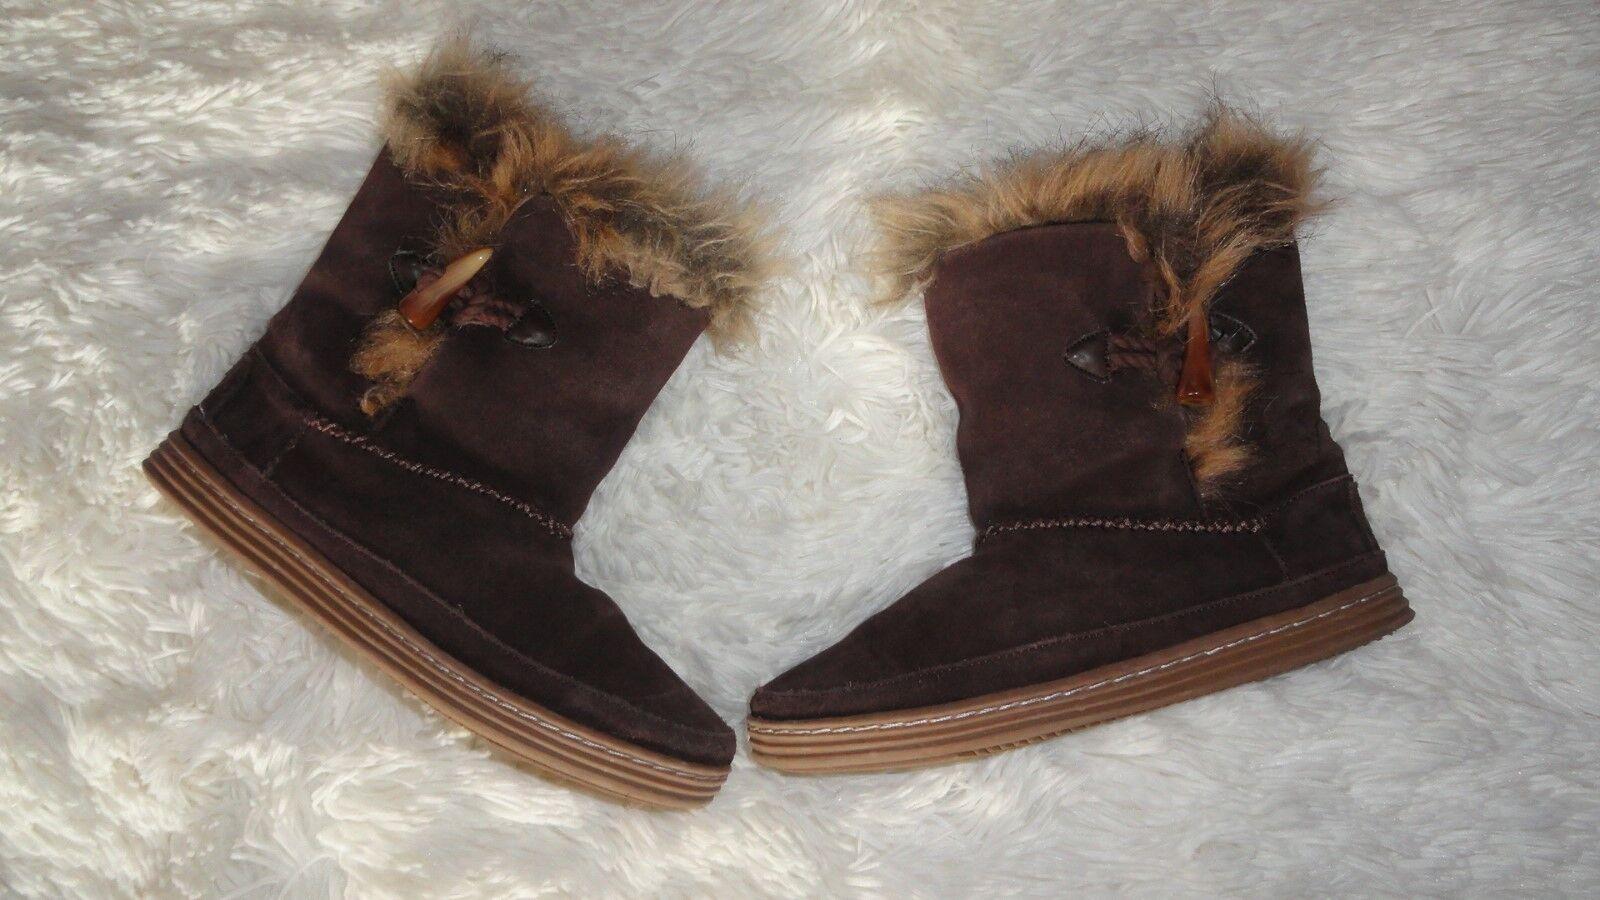 Roxy Stiefel Stiefeletten Schuhe Stiefel Gr 40